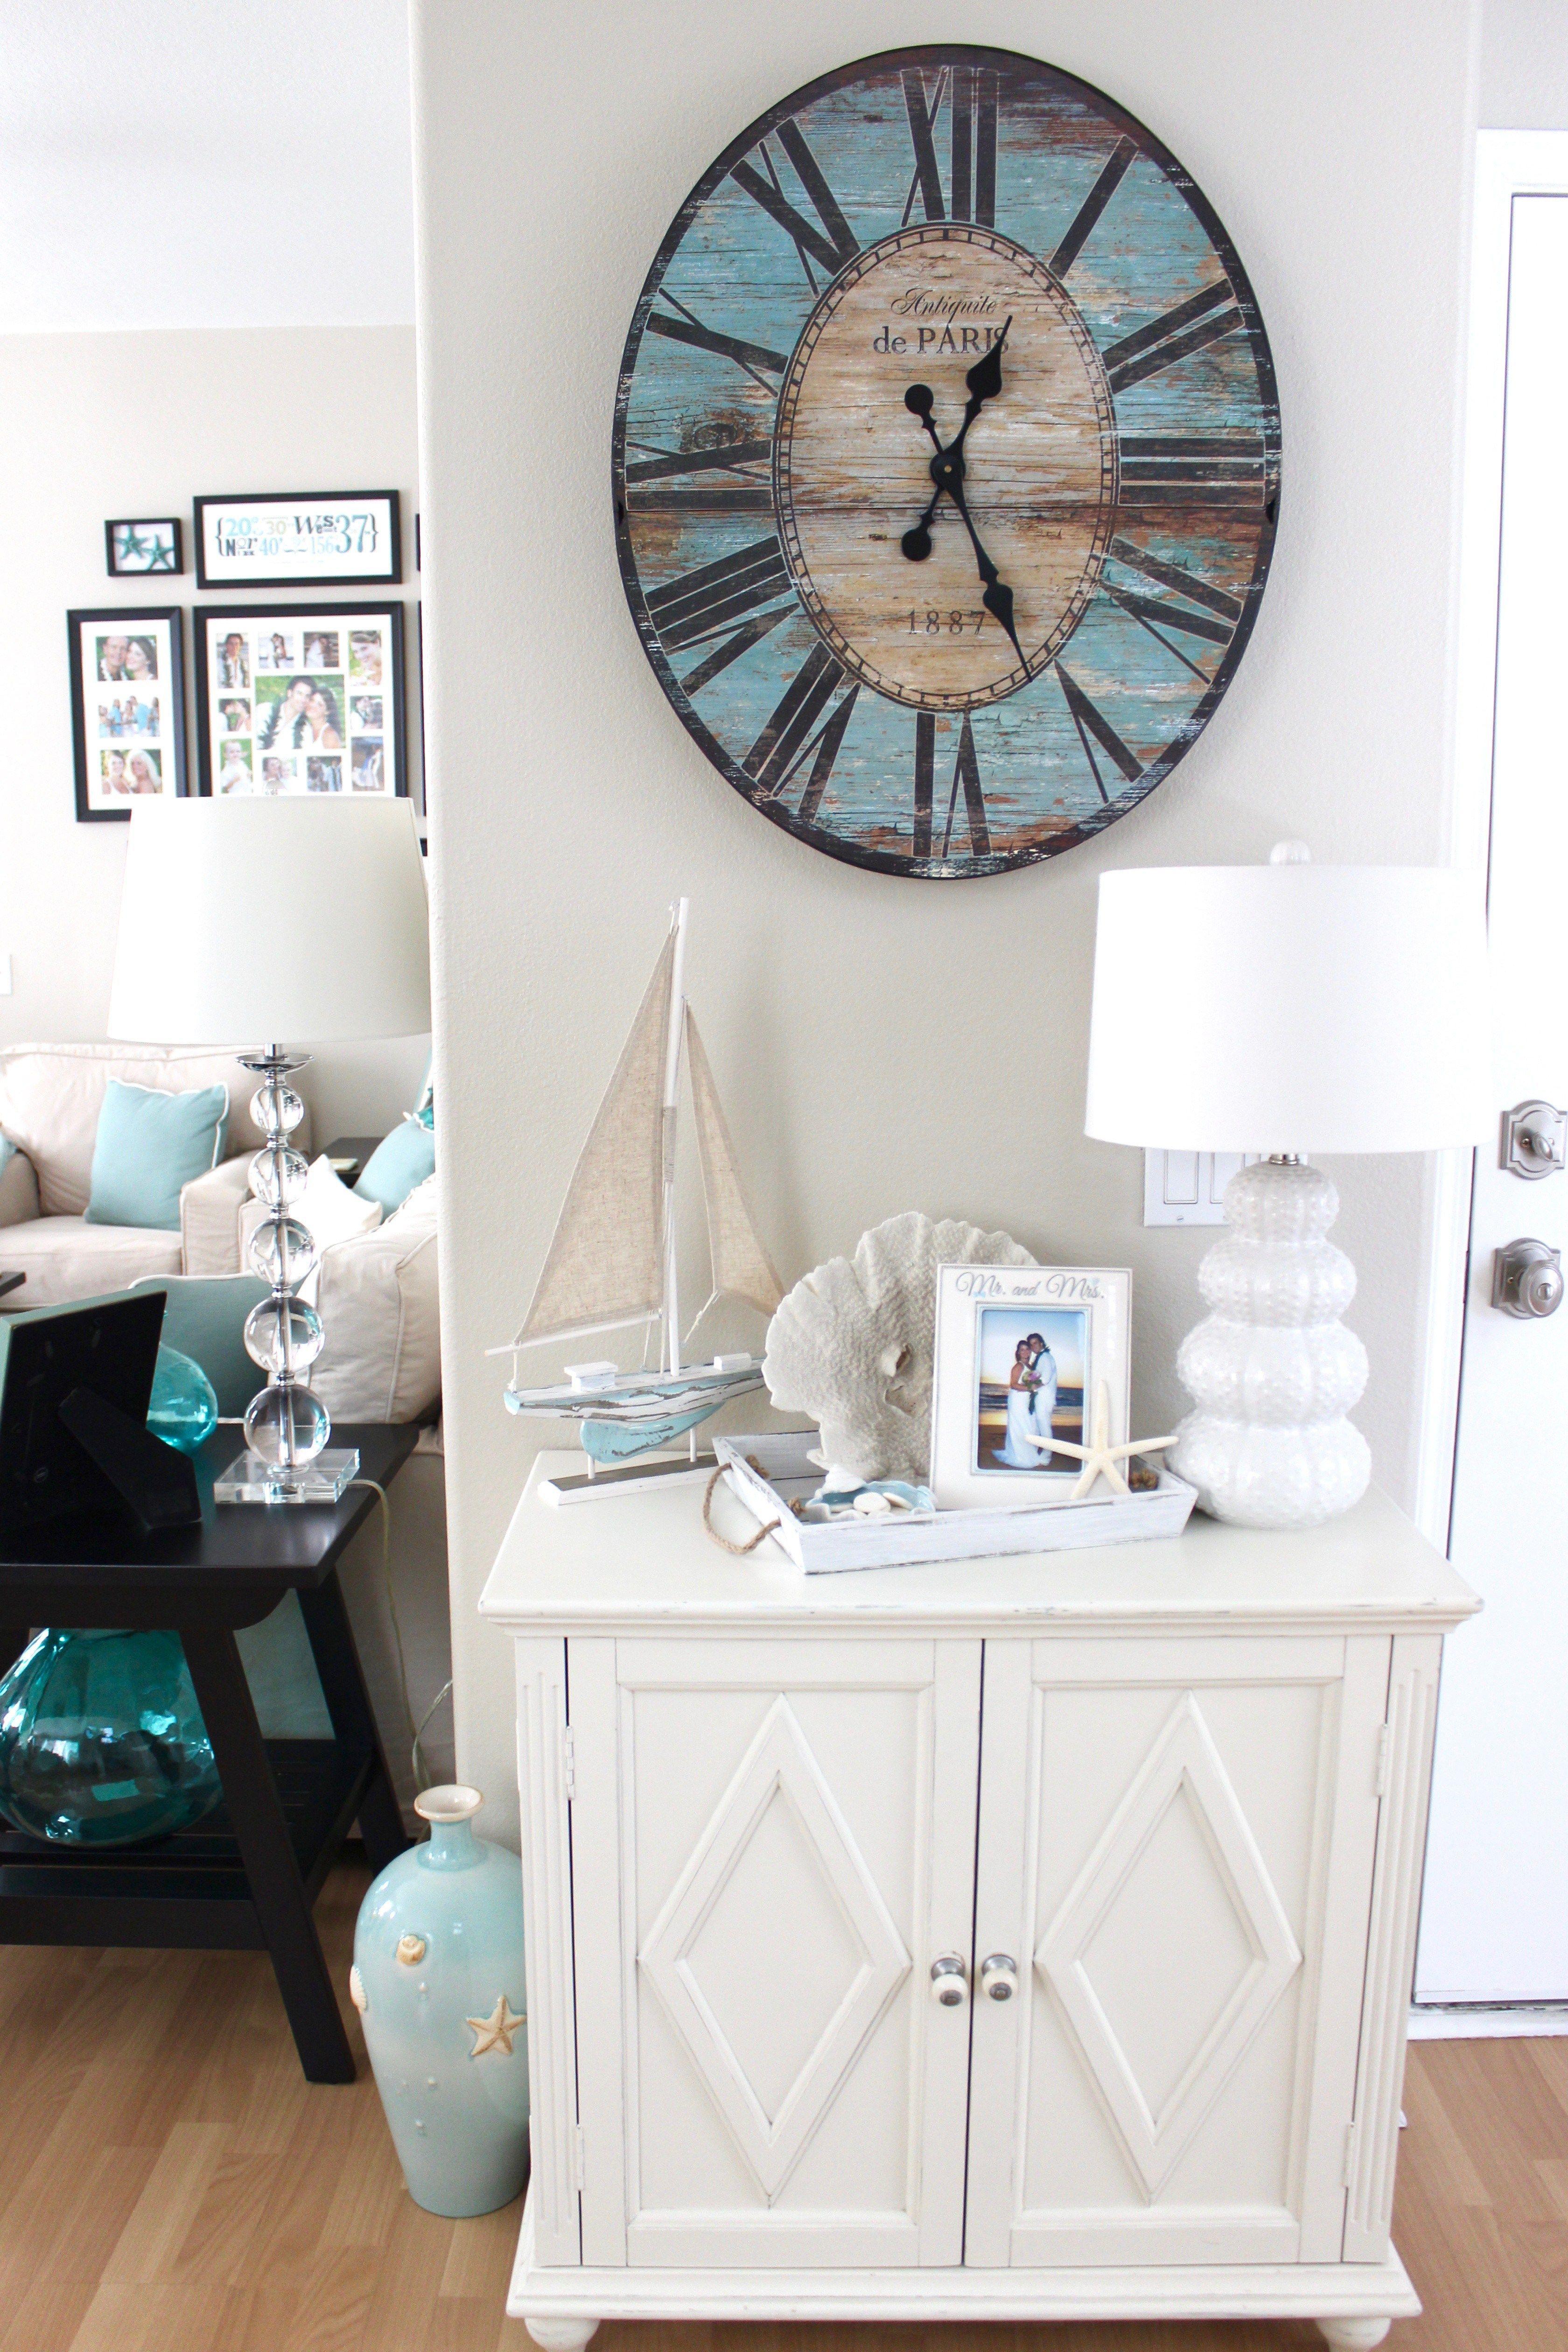 Beach House Decor - Rustic Clock | Coastal Style | Pinterest ...